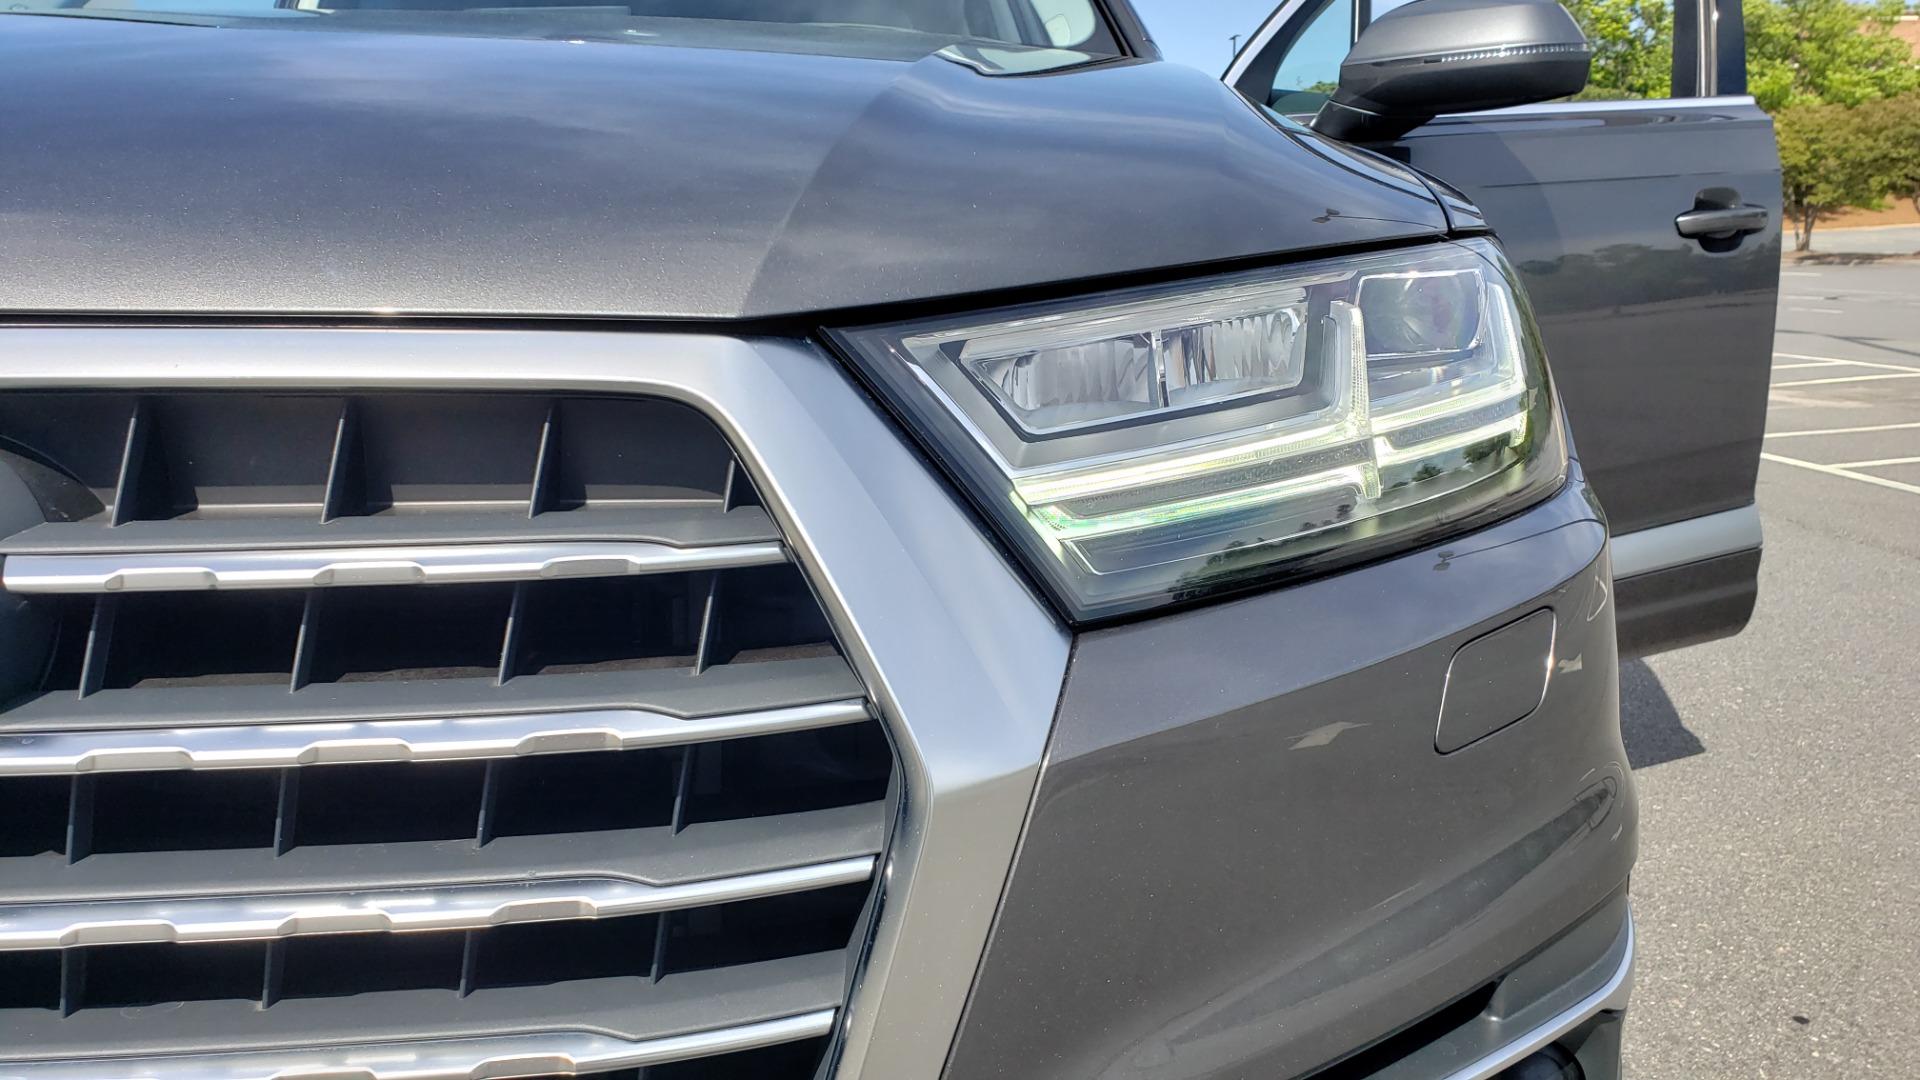 Used 2018 Audi Q7 PRESTIGE TIPTRONIC / NAV / SUNROOF / ADAPTIVE PKG / DRVR ASST / CLD WTHR /  for sale $49,995 at Formula Imports in Charlotte NC 28227 22